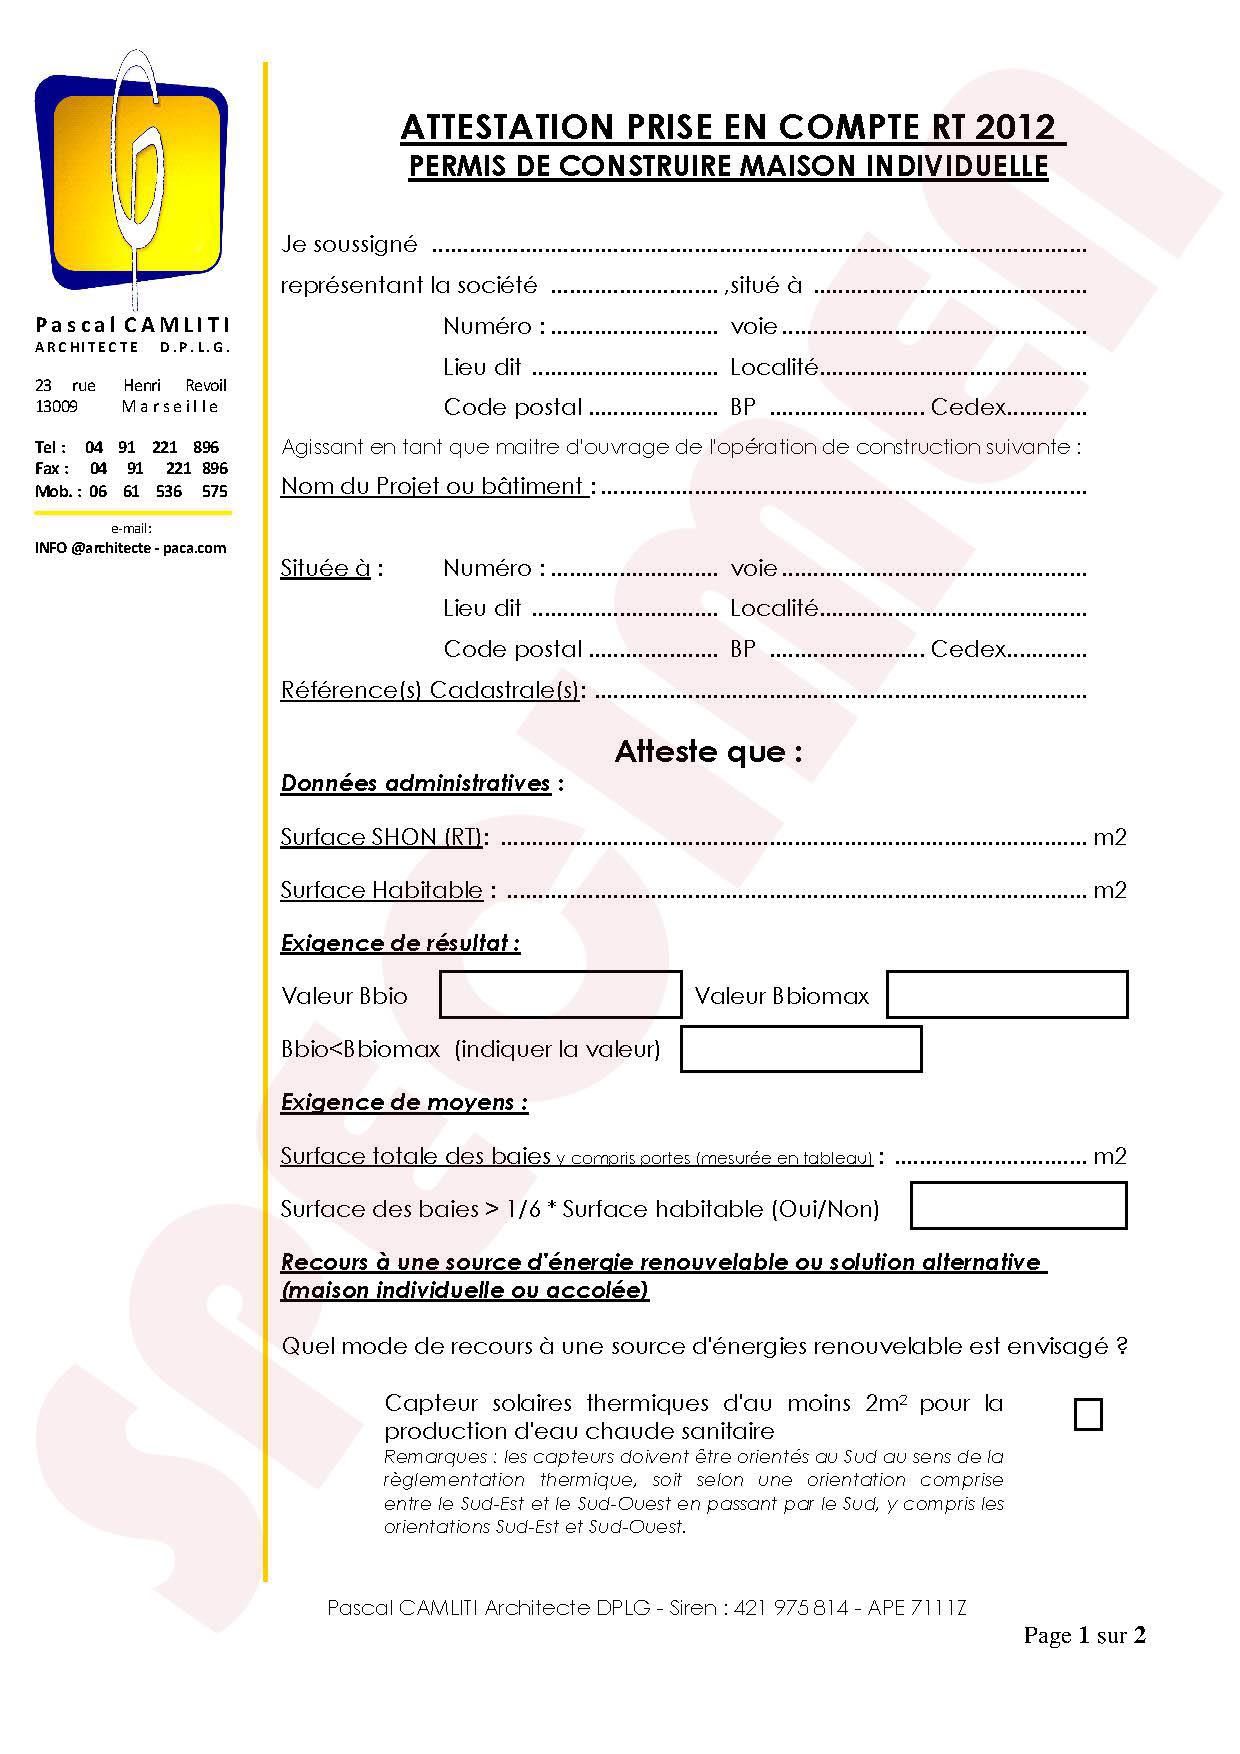 ATTESTATION-PERMIS-CONSTRUIRE-RT2012-PAGE01